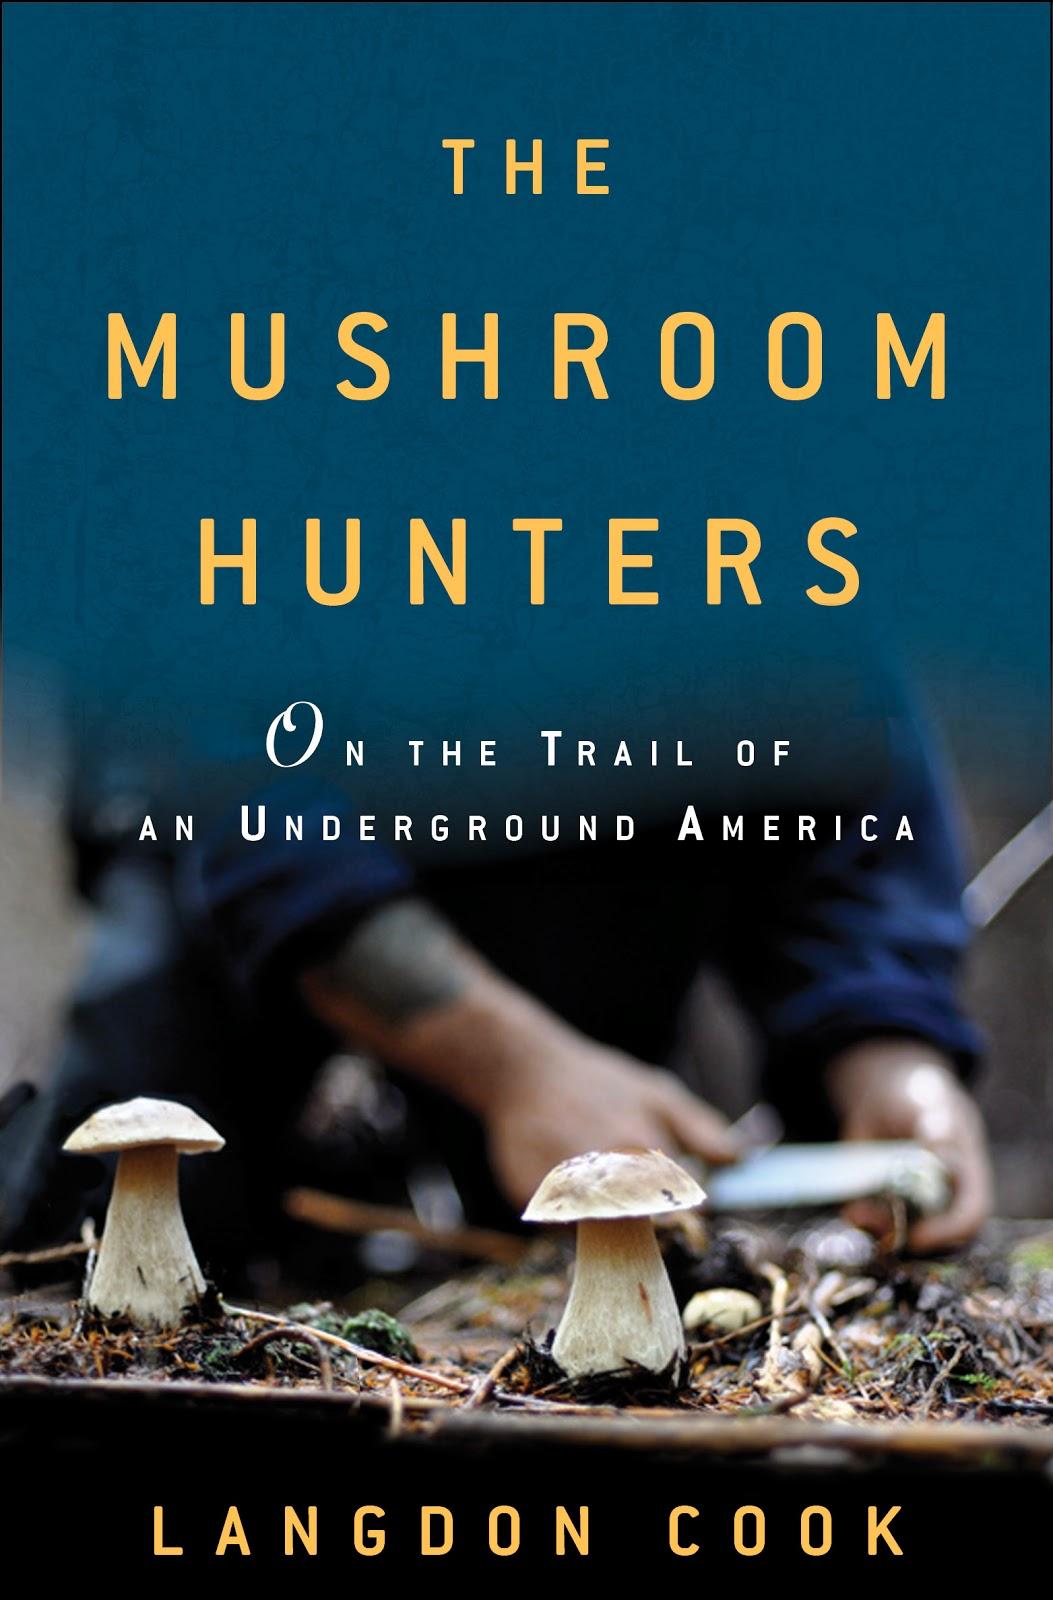 Mushroom Hunters by Langdon Cook